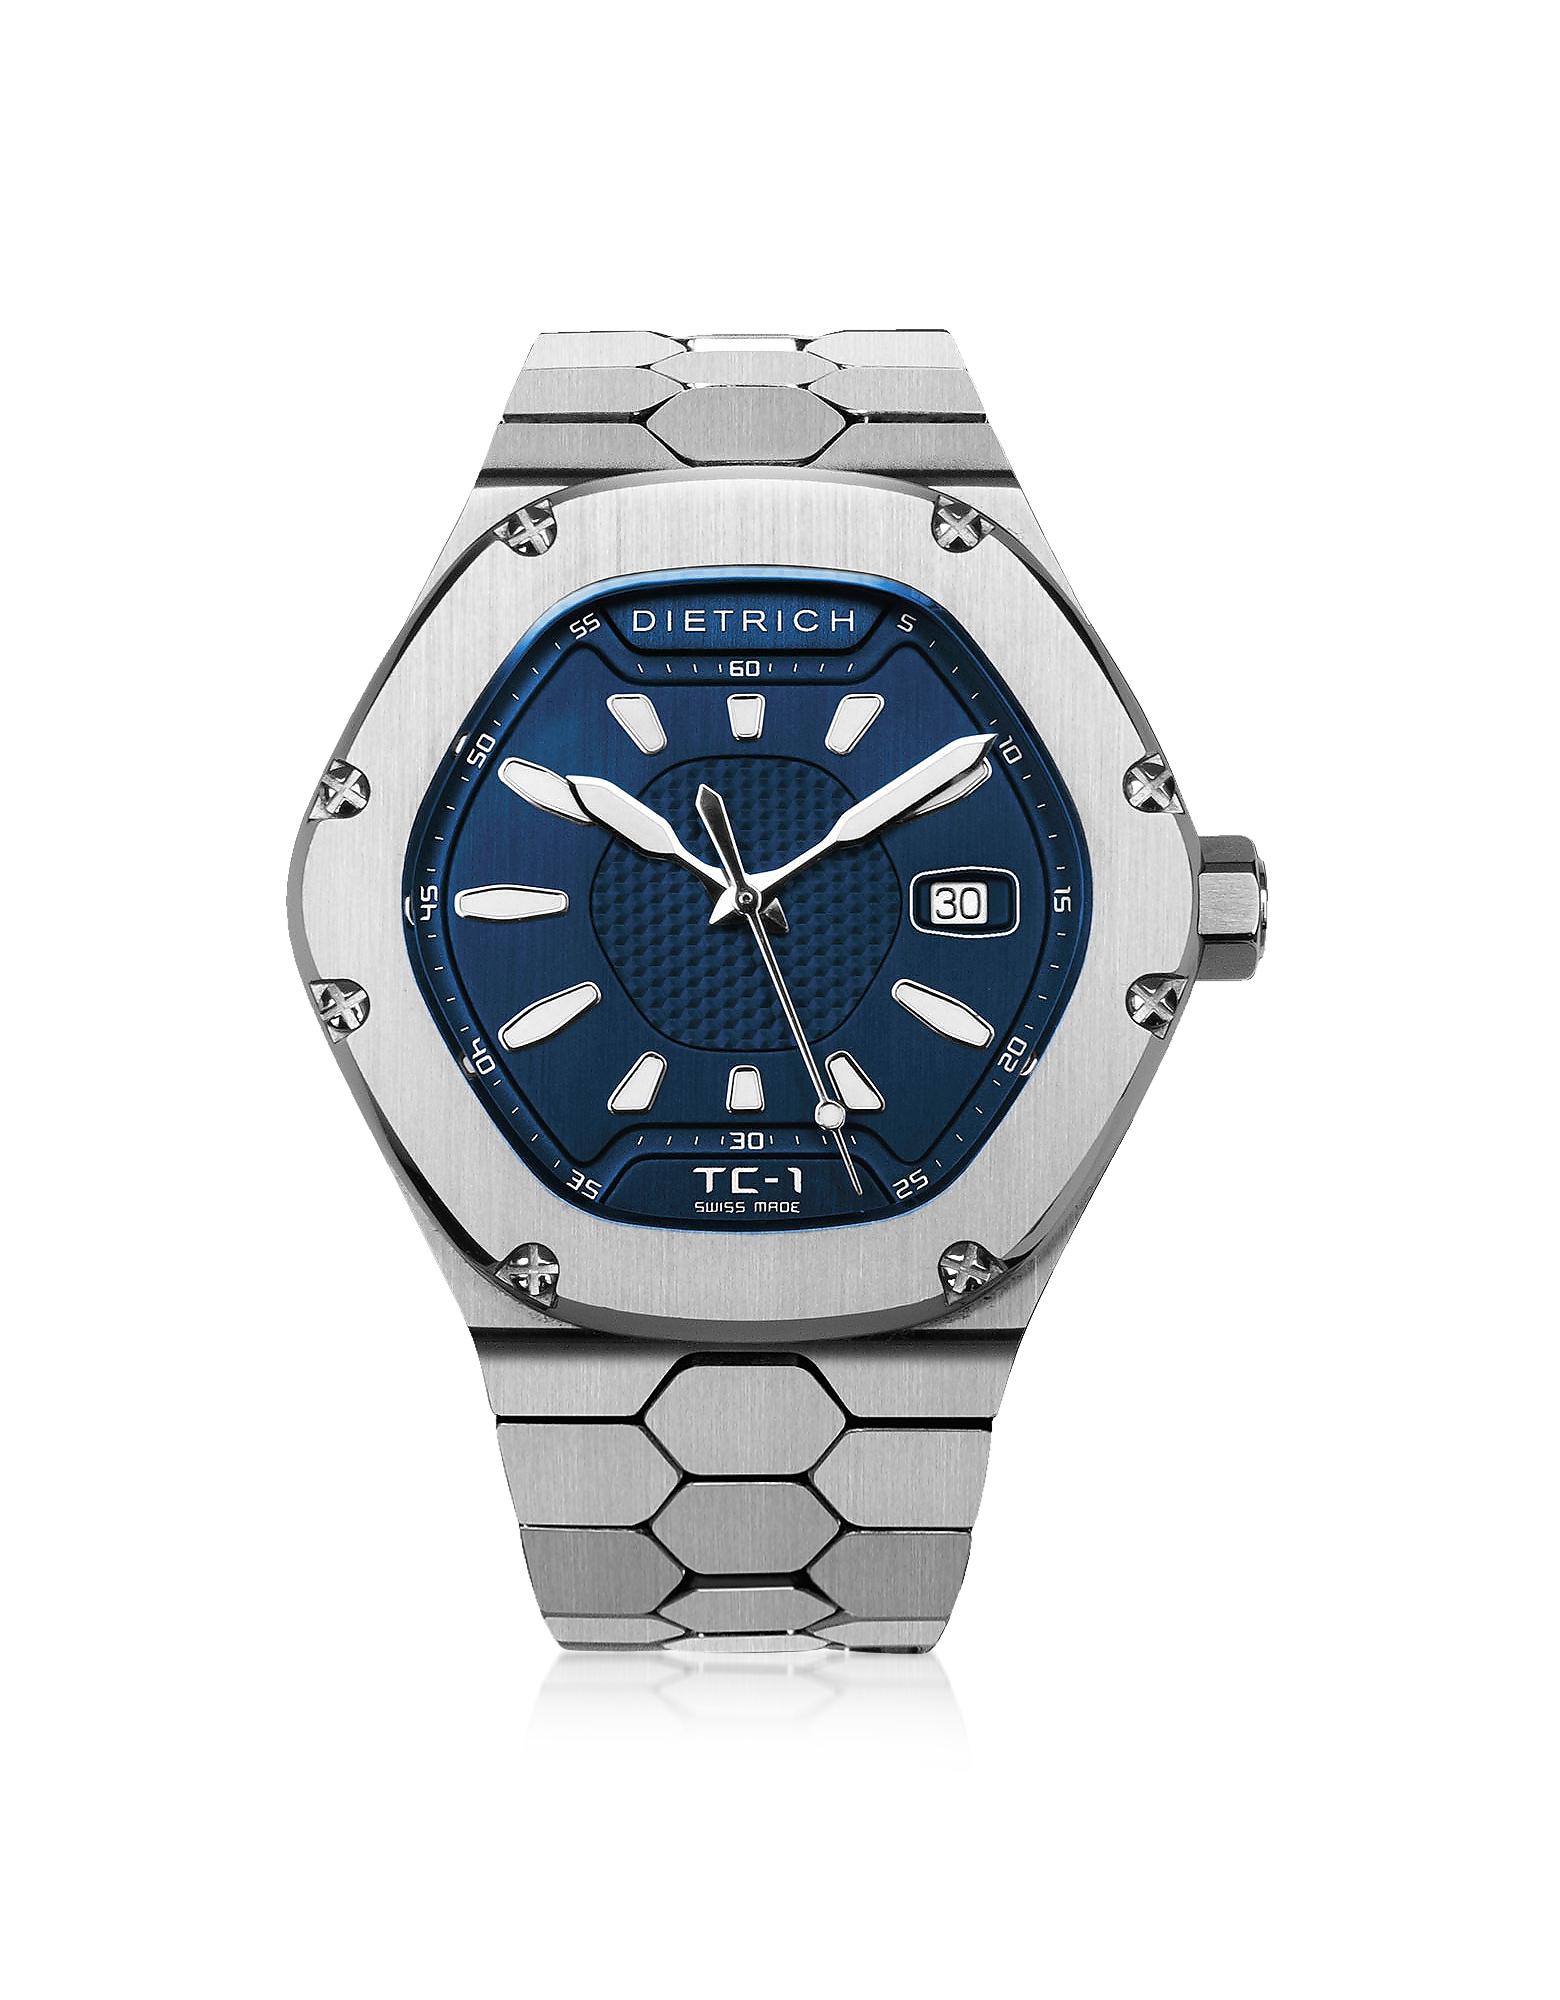 Dietrich Designer Men's Watches, TC-1 SS 316L Steel w/White Luminova and Blue Dial